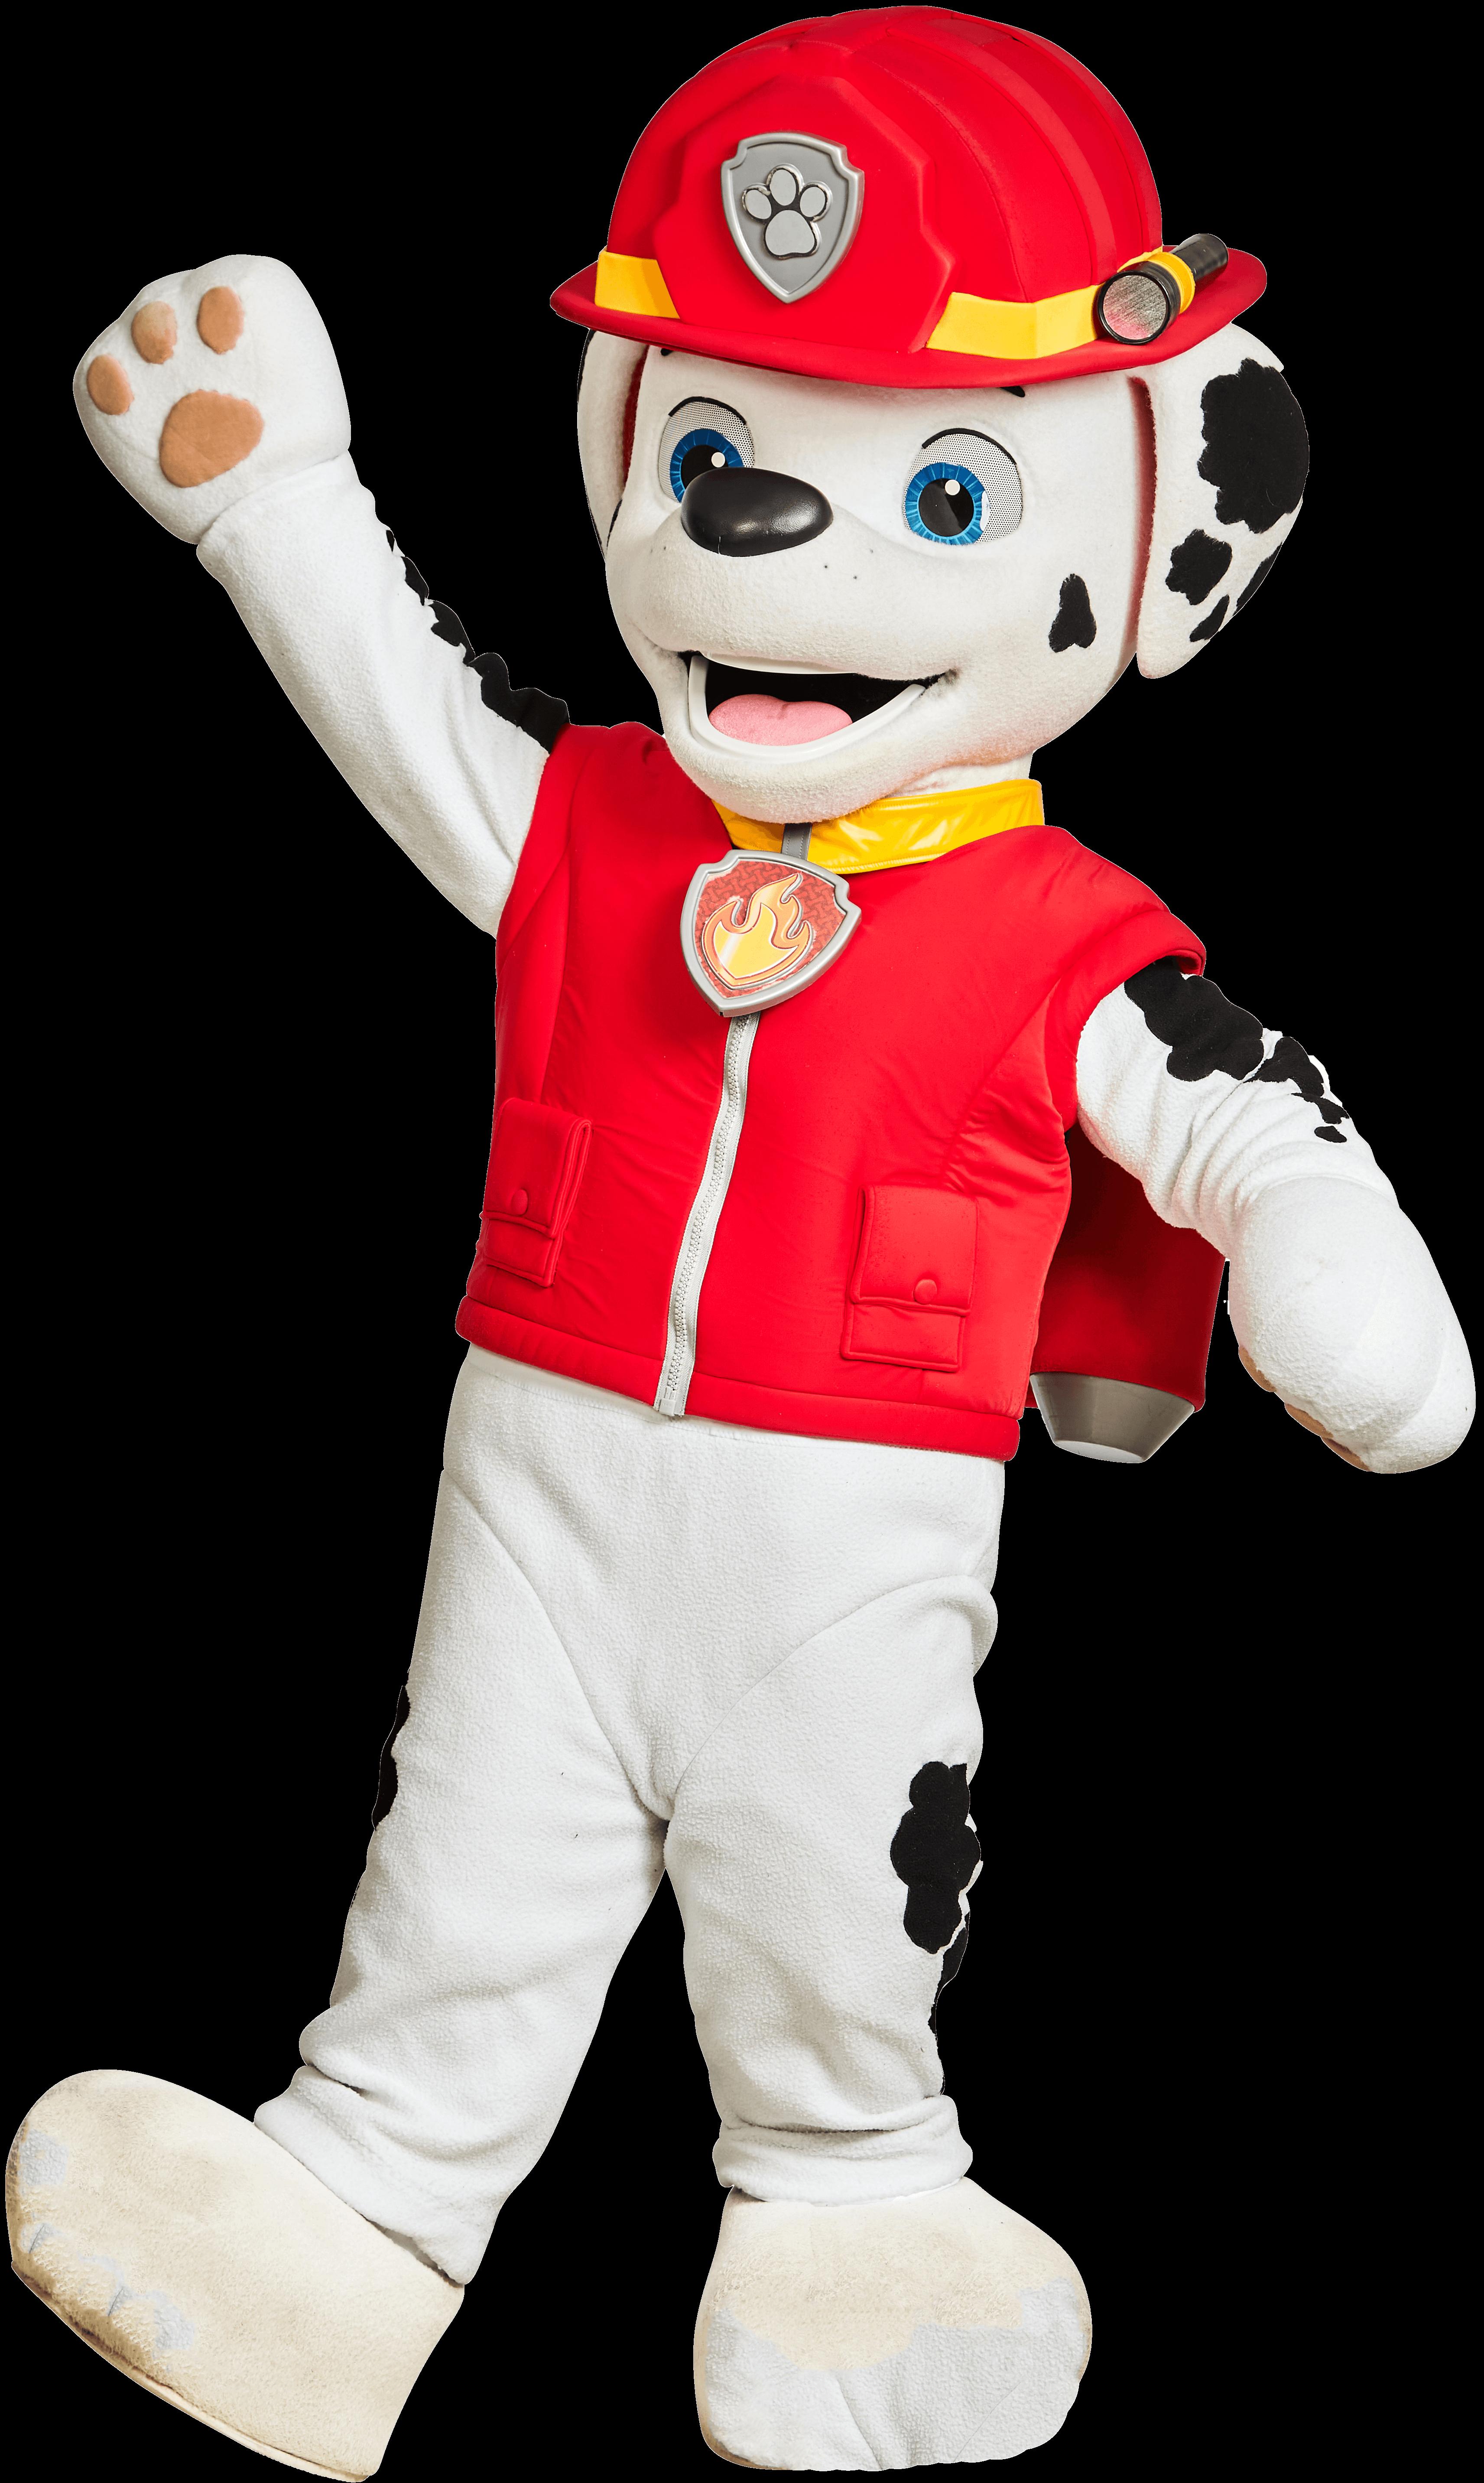 Marshall-paw-patrol-show-event-glad-dag-for-børn-event